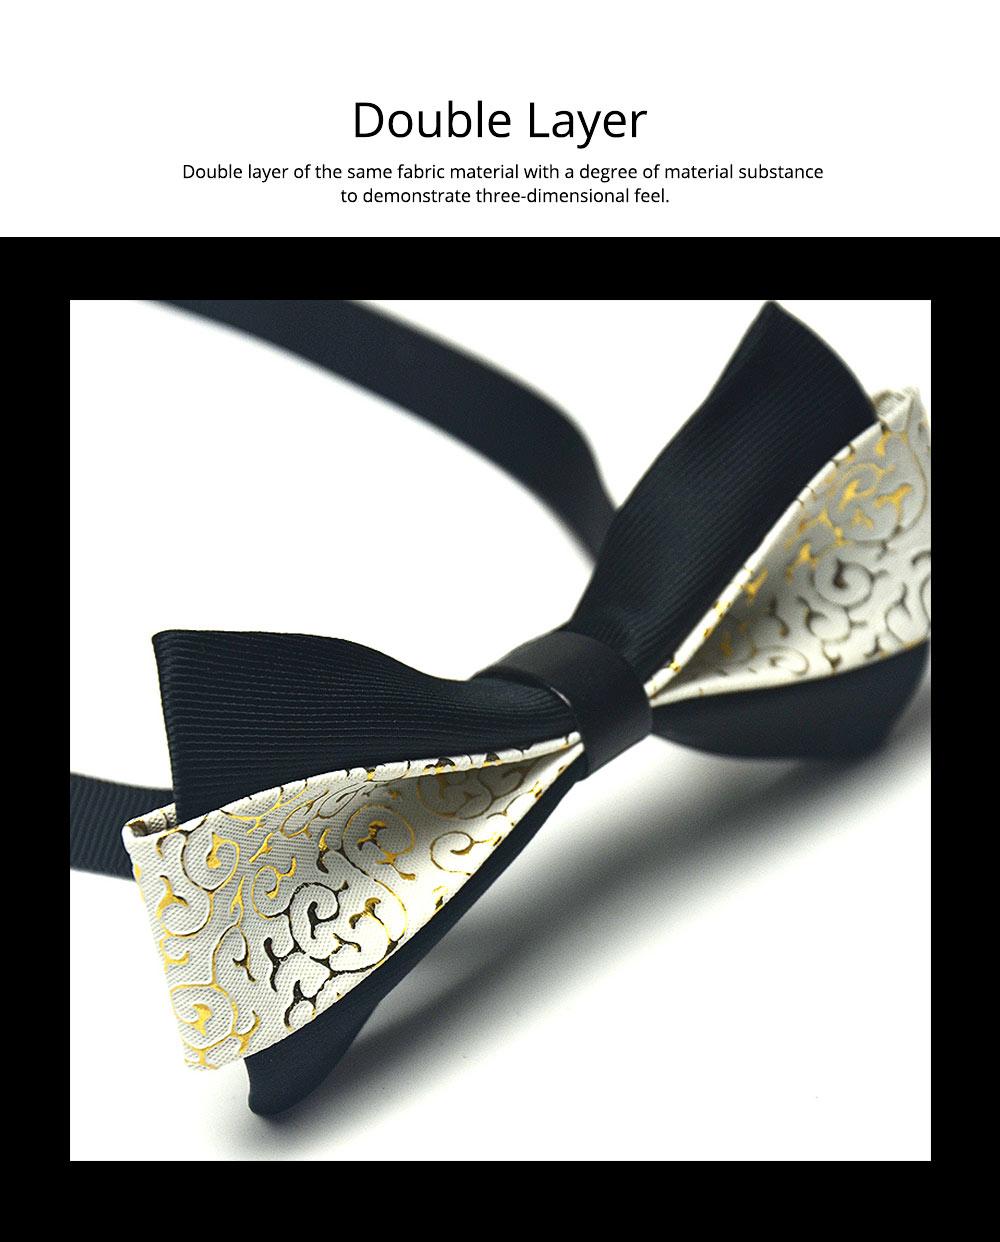 Bow Tie of PU Leather for Wedding Business Suit Bow Tie Fashionable British Style Elviro Tie Bridegroom Groomsman Used Bow Tie 2